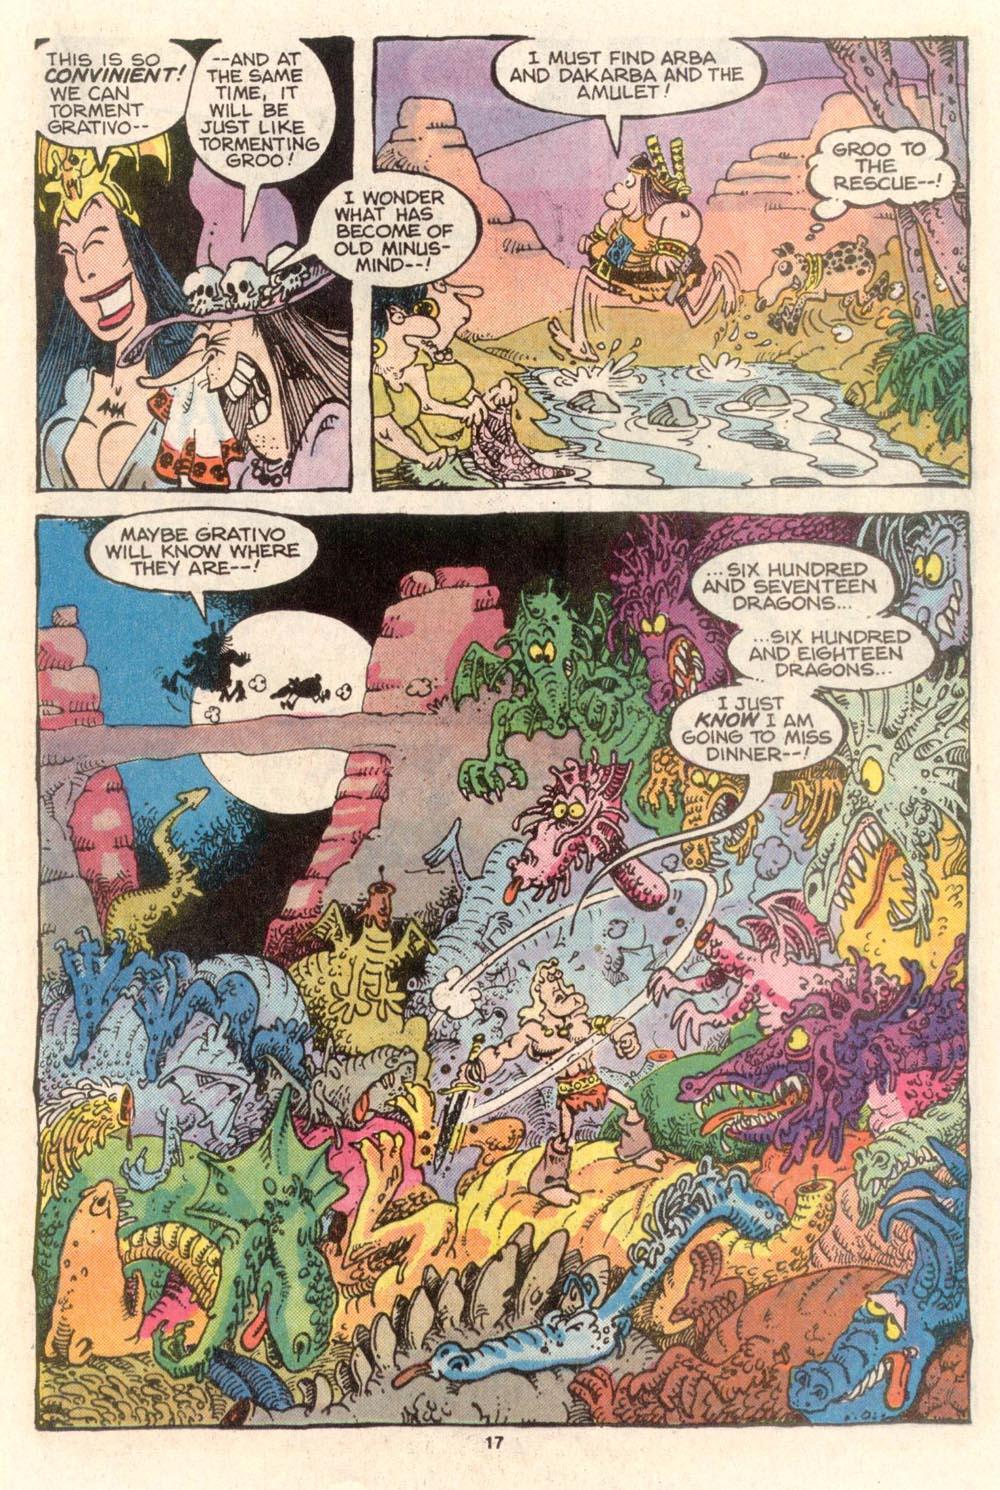 Read online Sergio Aragonés Groo the Wanderer comic -  Issue #36 - 17